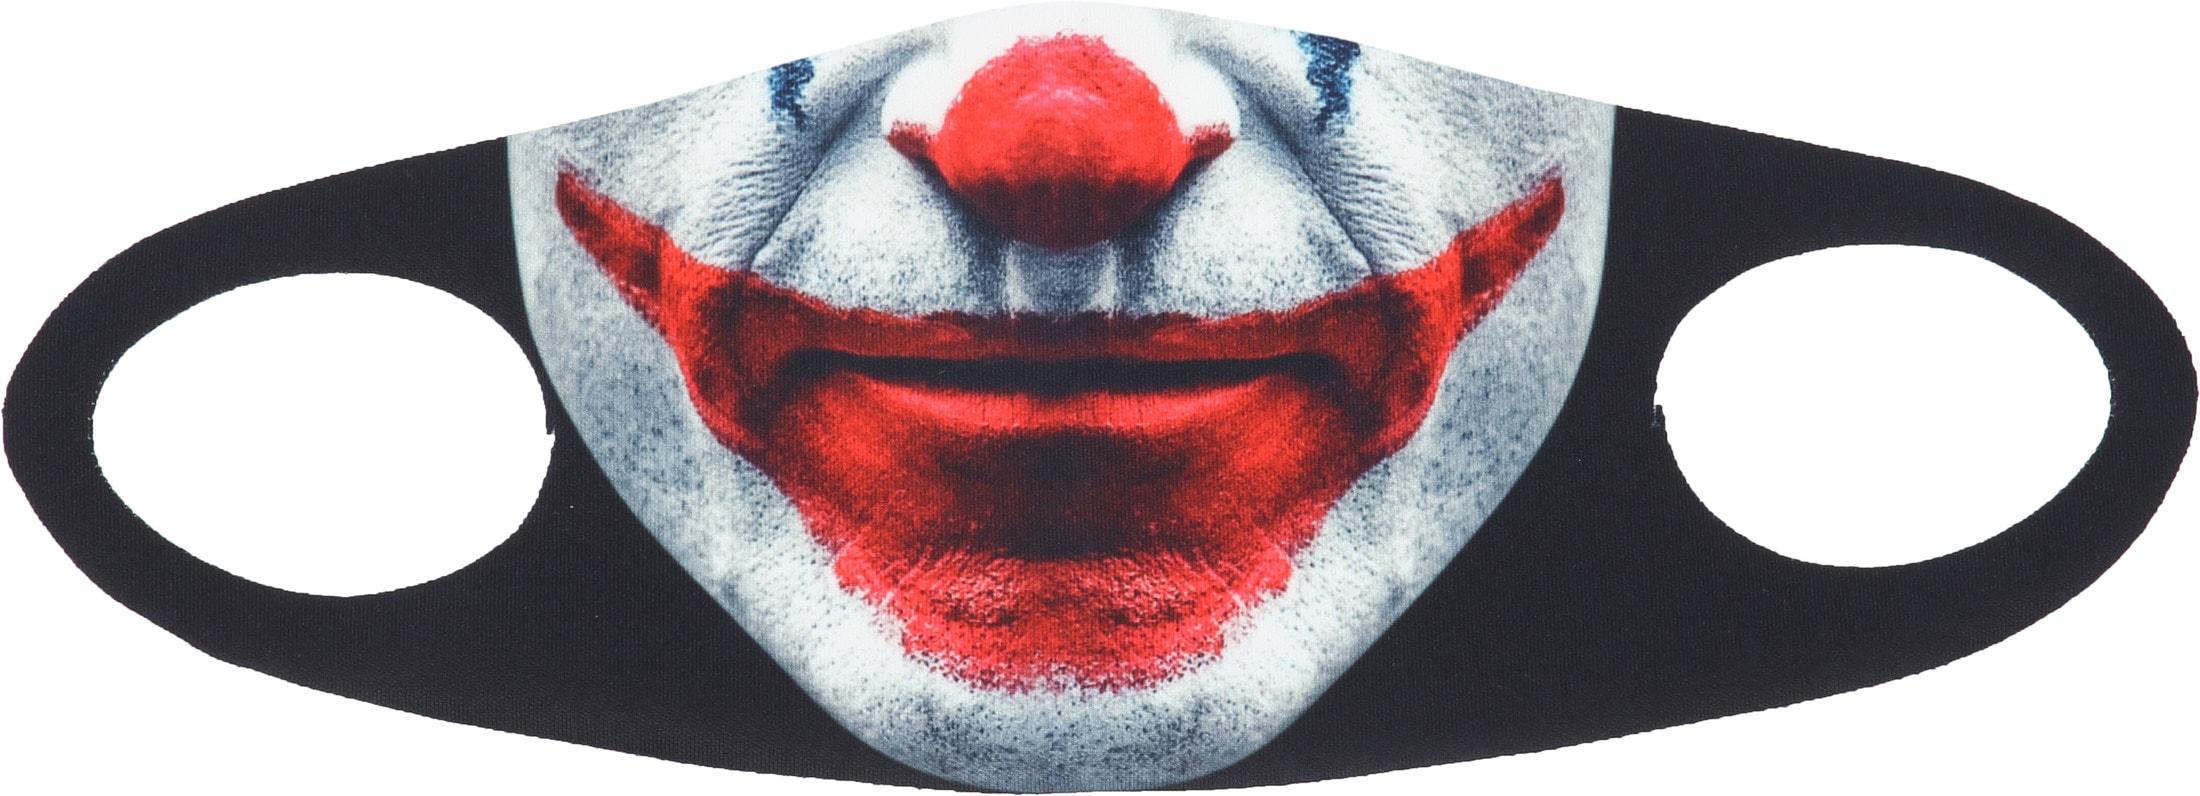 Suitable Mondkapje Print Joker foto 0